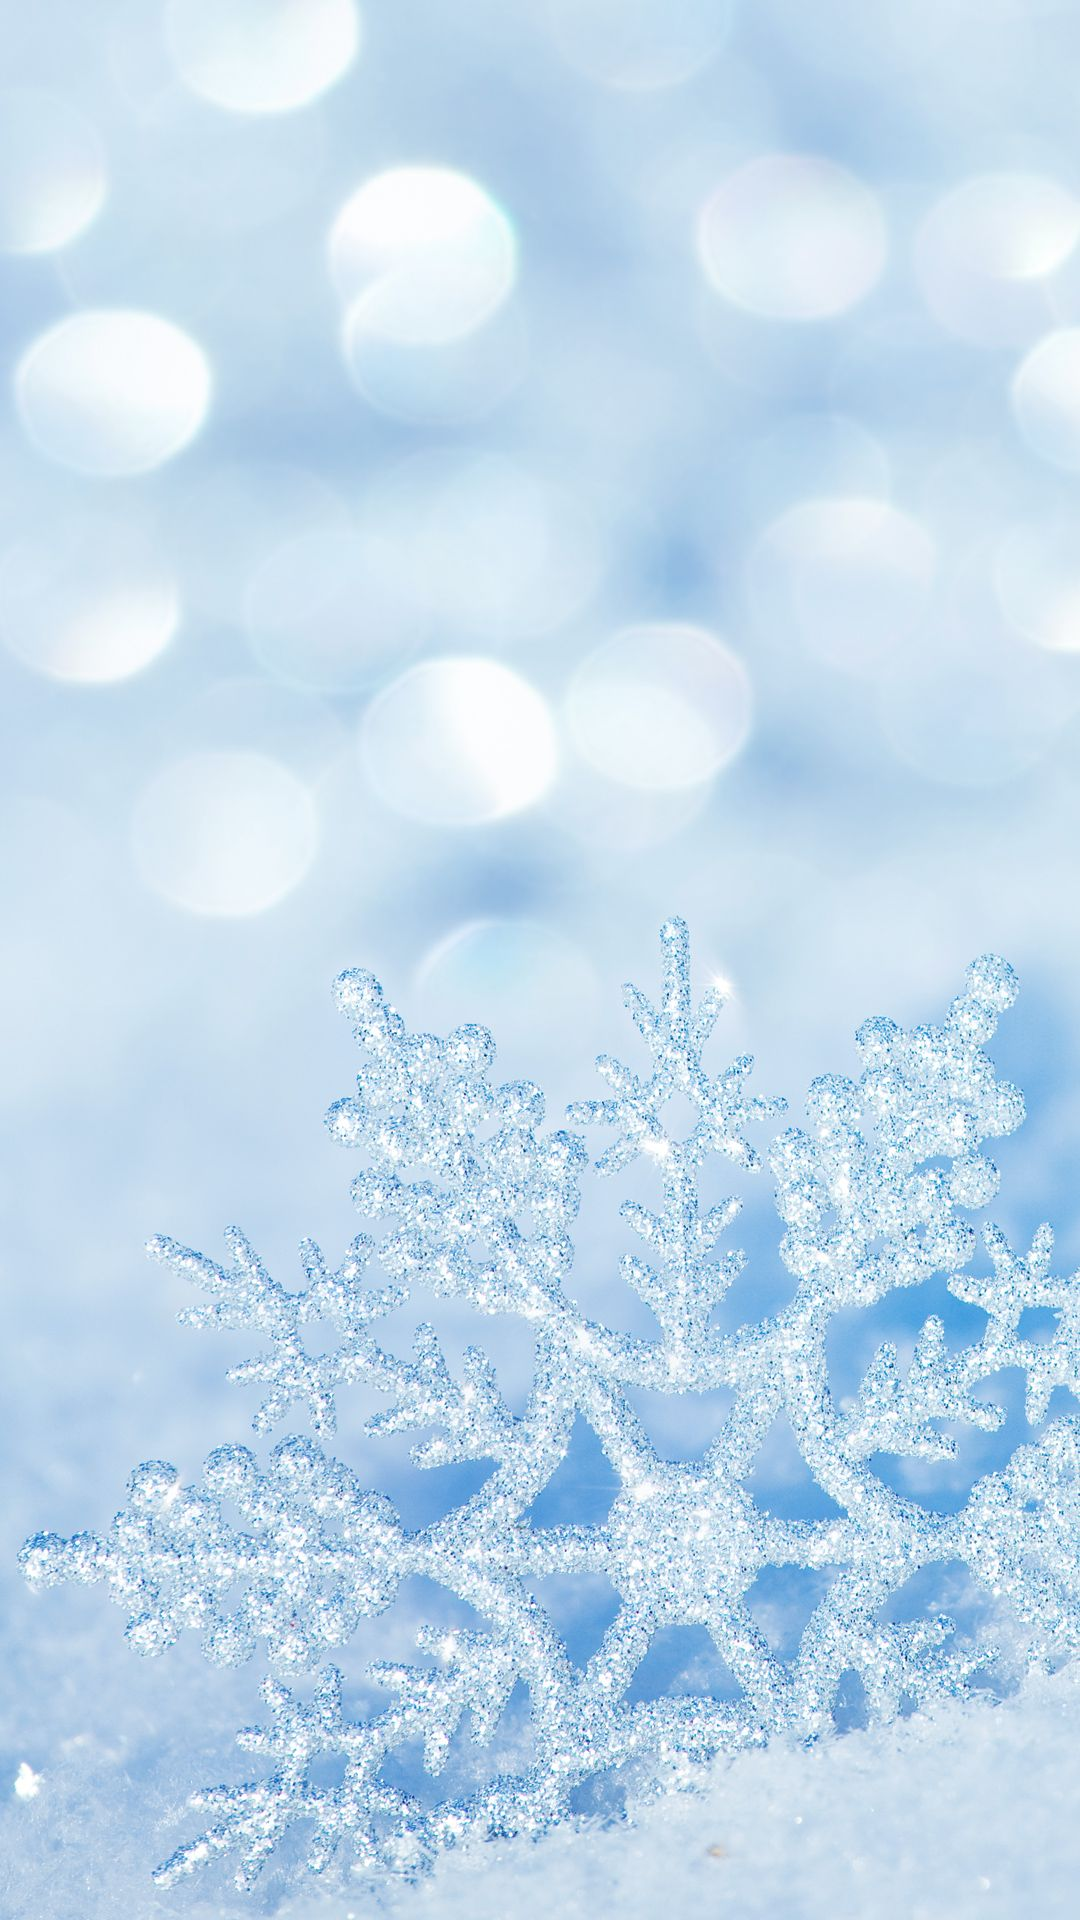 Winter Snowflake iPhone 7 Plus Wallpaper | Wallpapers ...